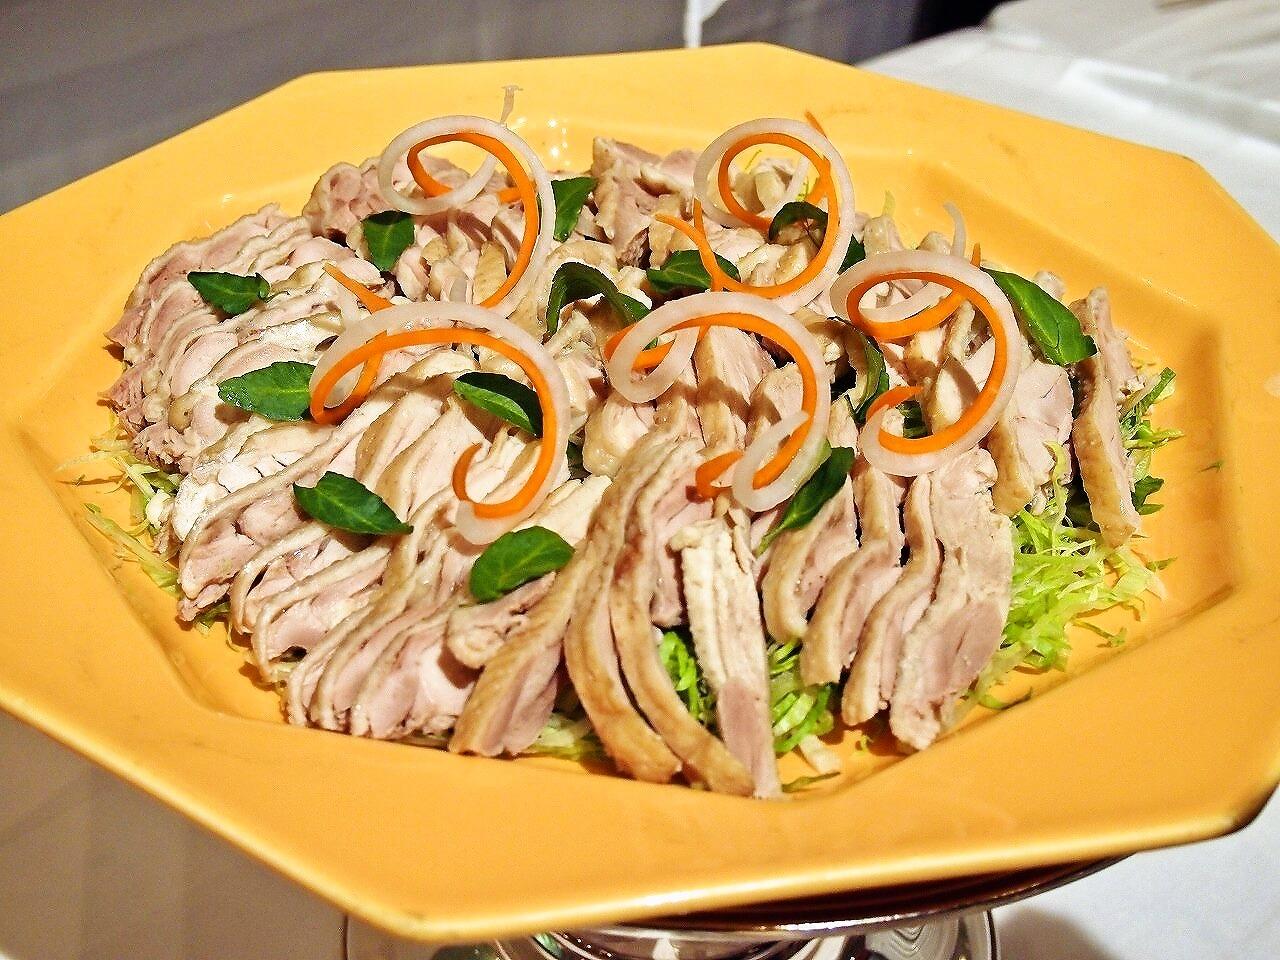 s-foodpic7478869.jpg